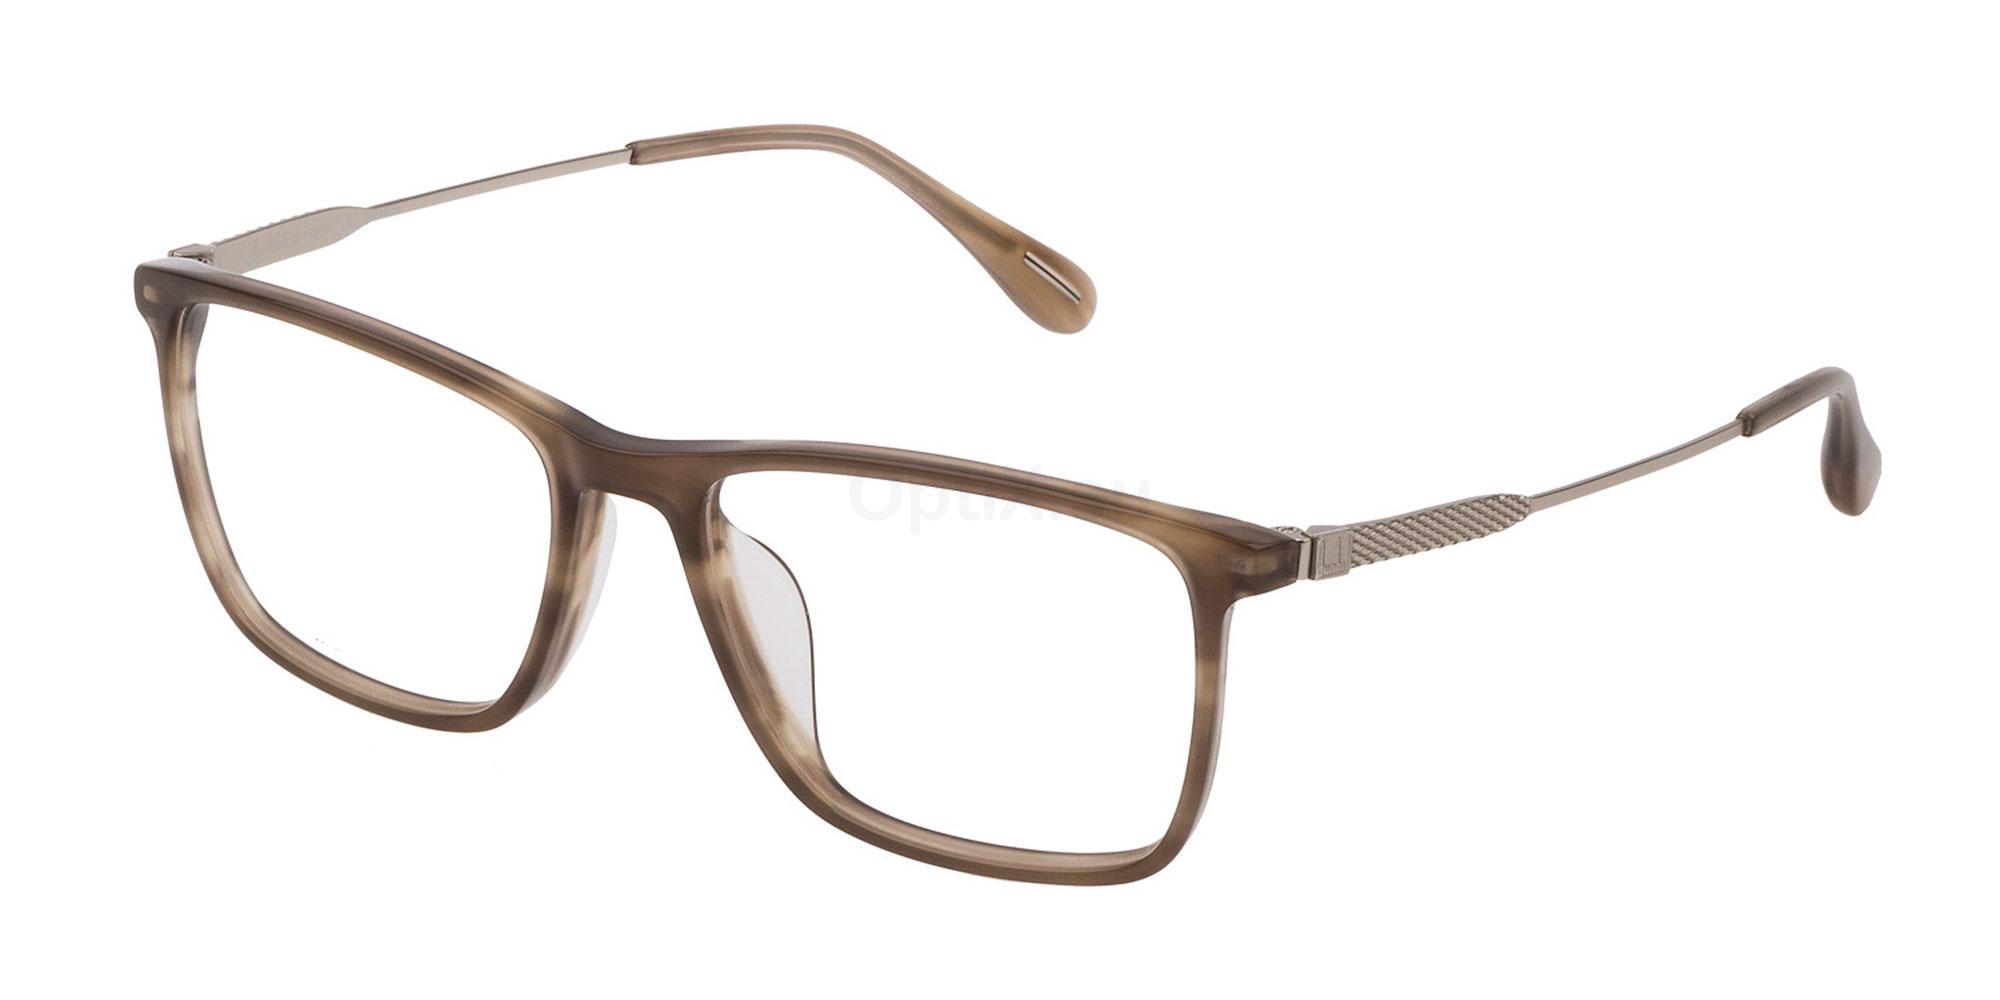 01F9 VDH169G Glasses, Dunhill London